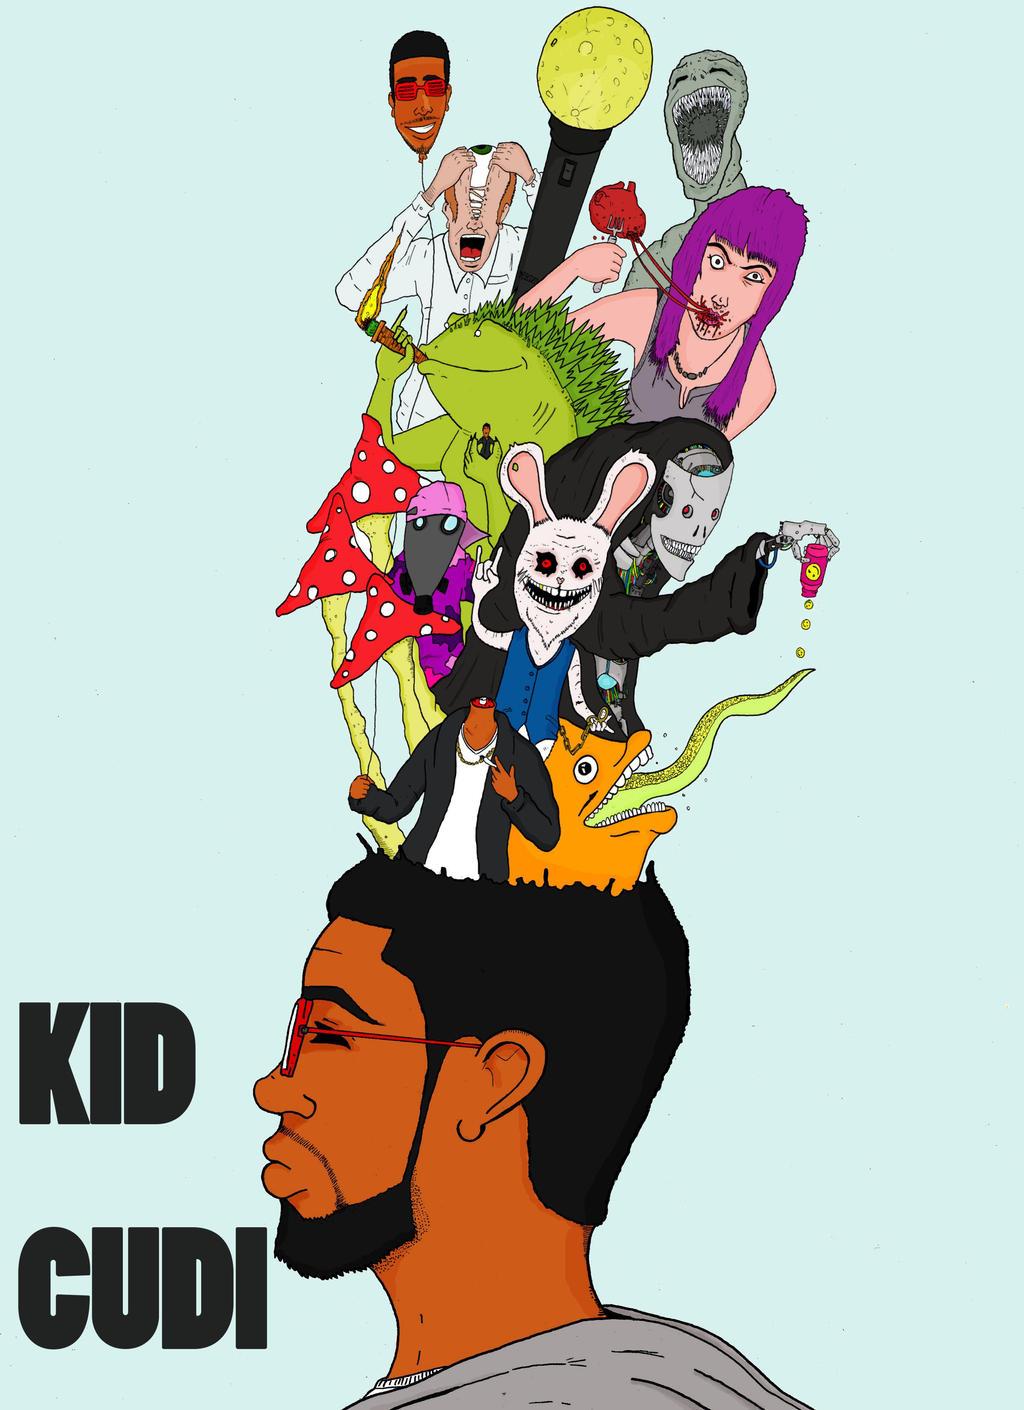 Kid Cudi Tour